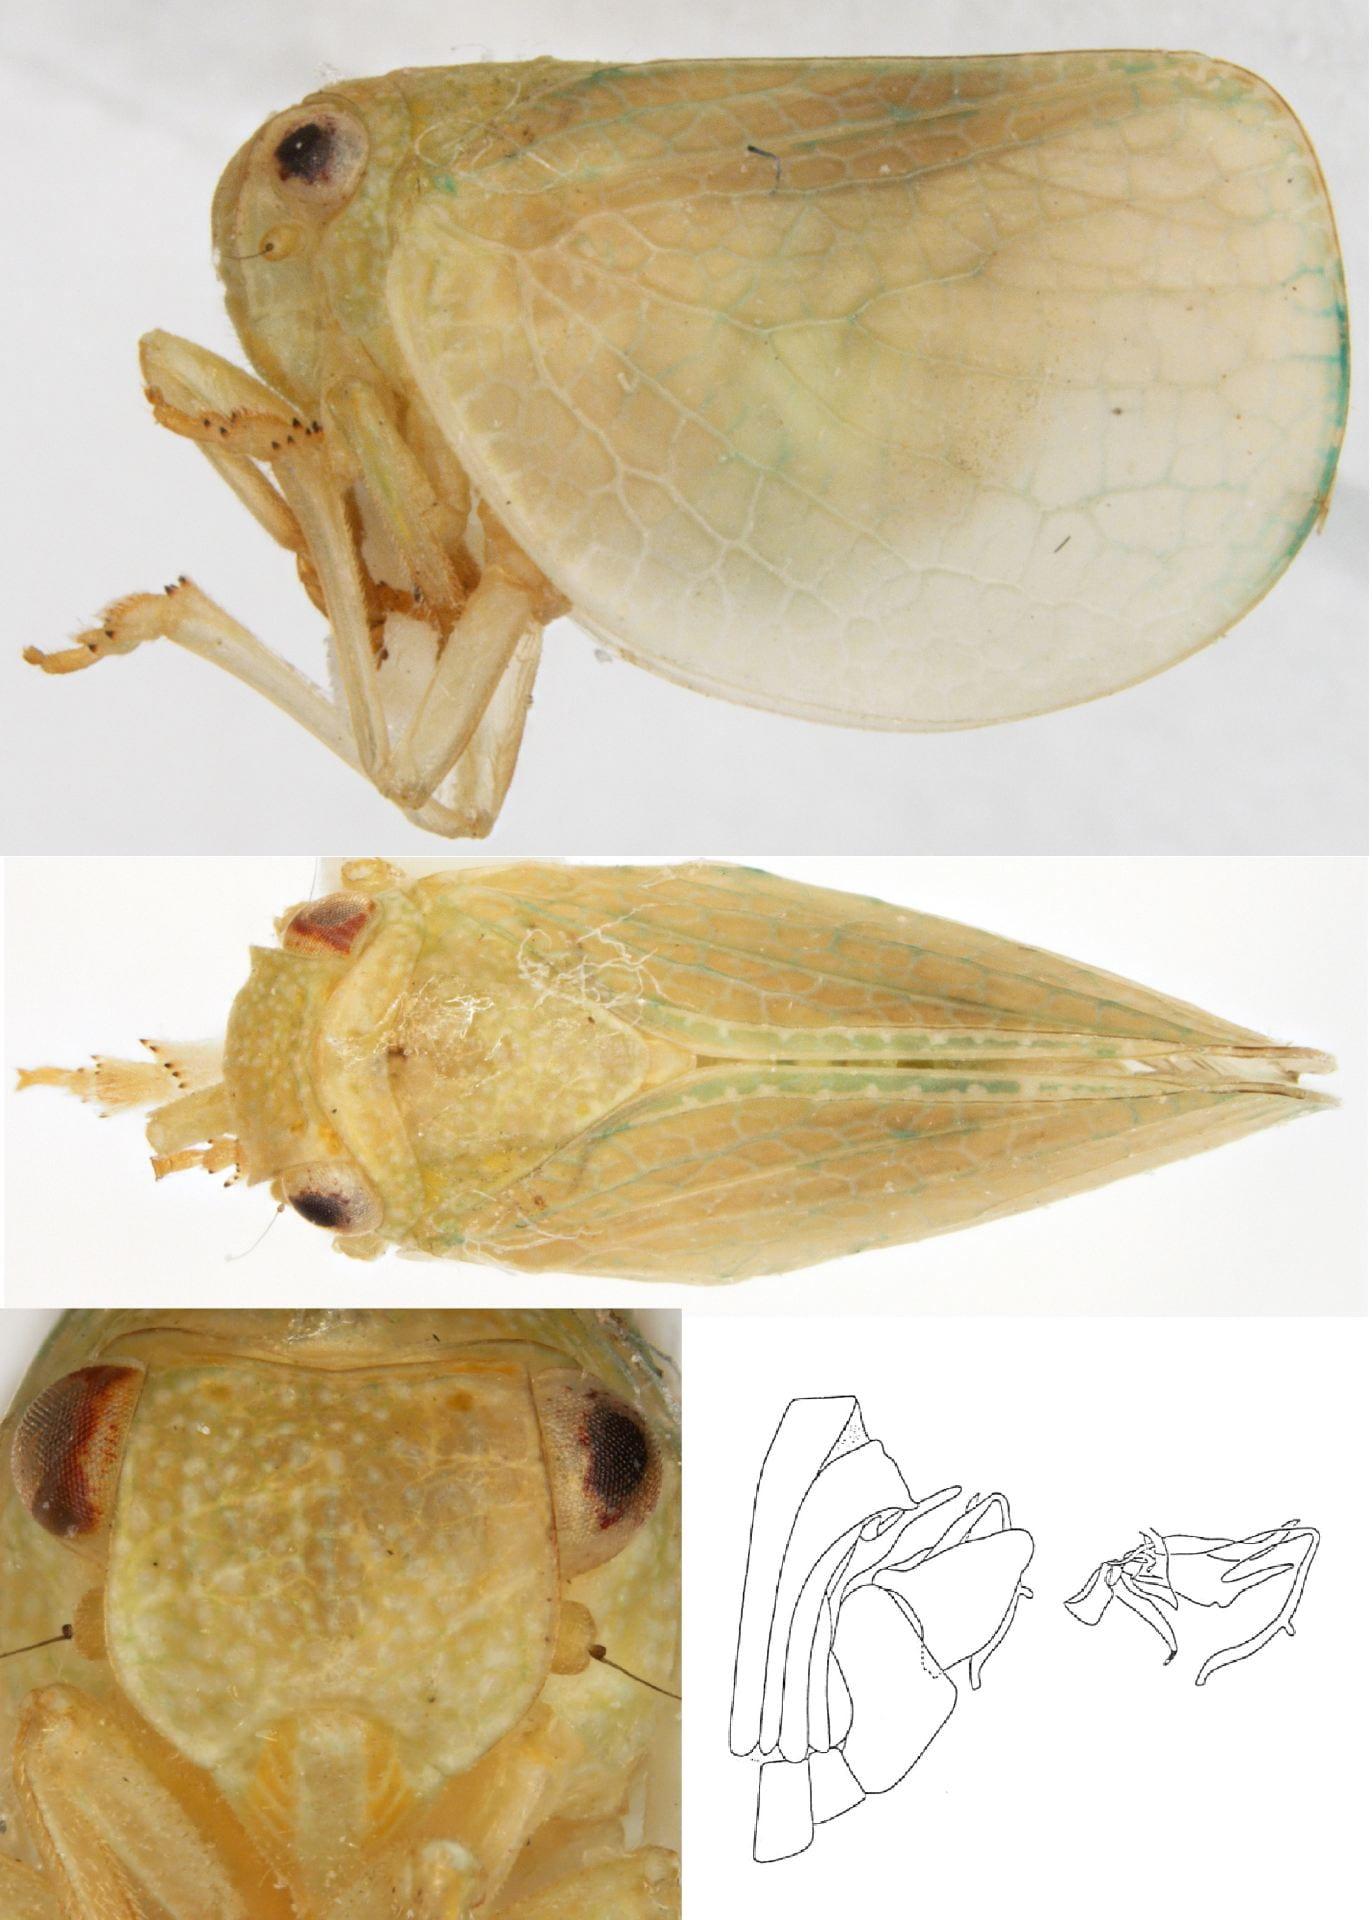 Acanalonia immaculata